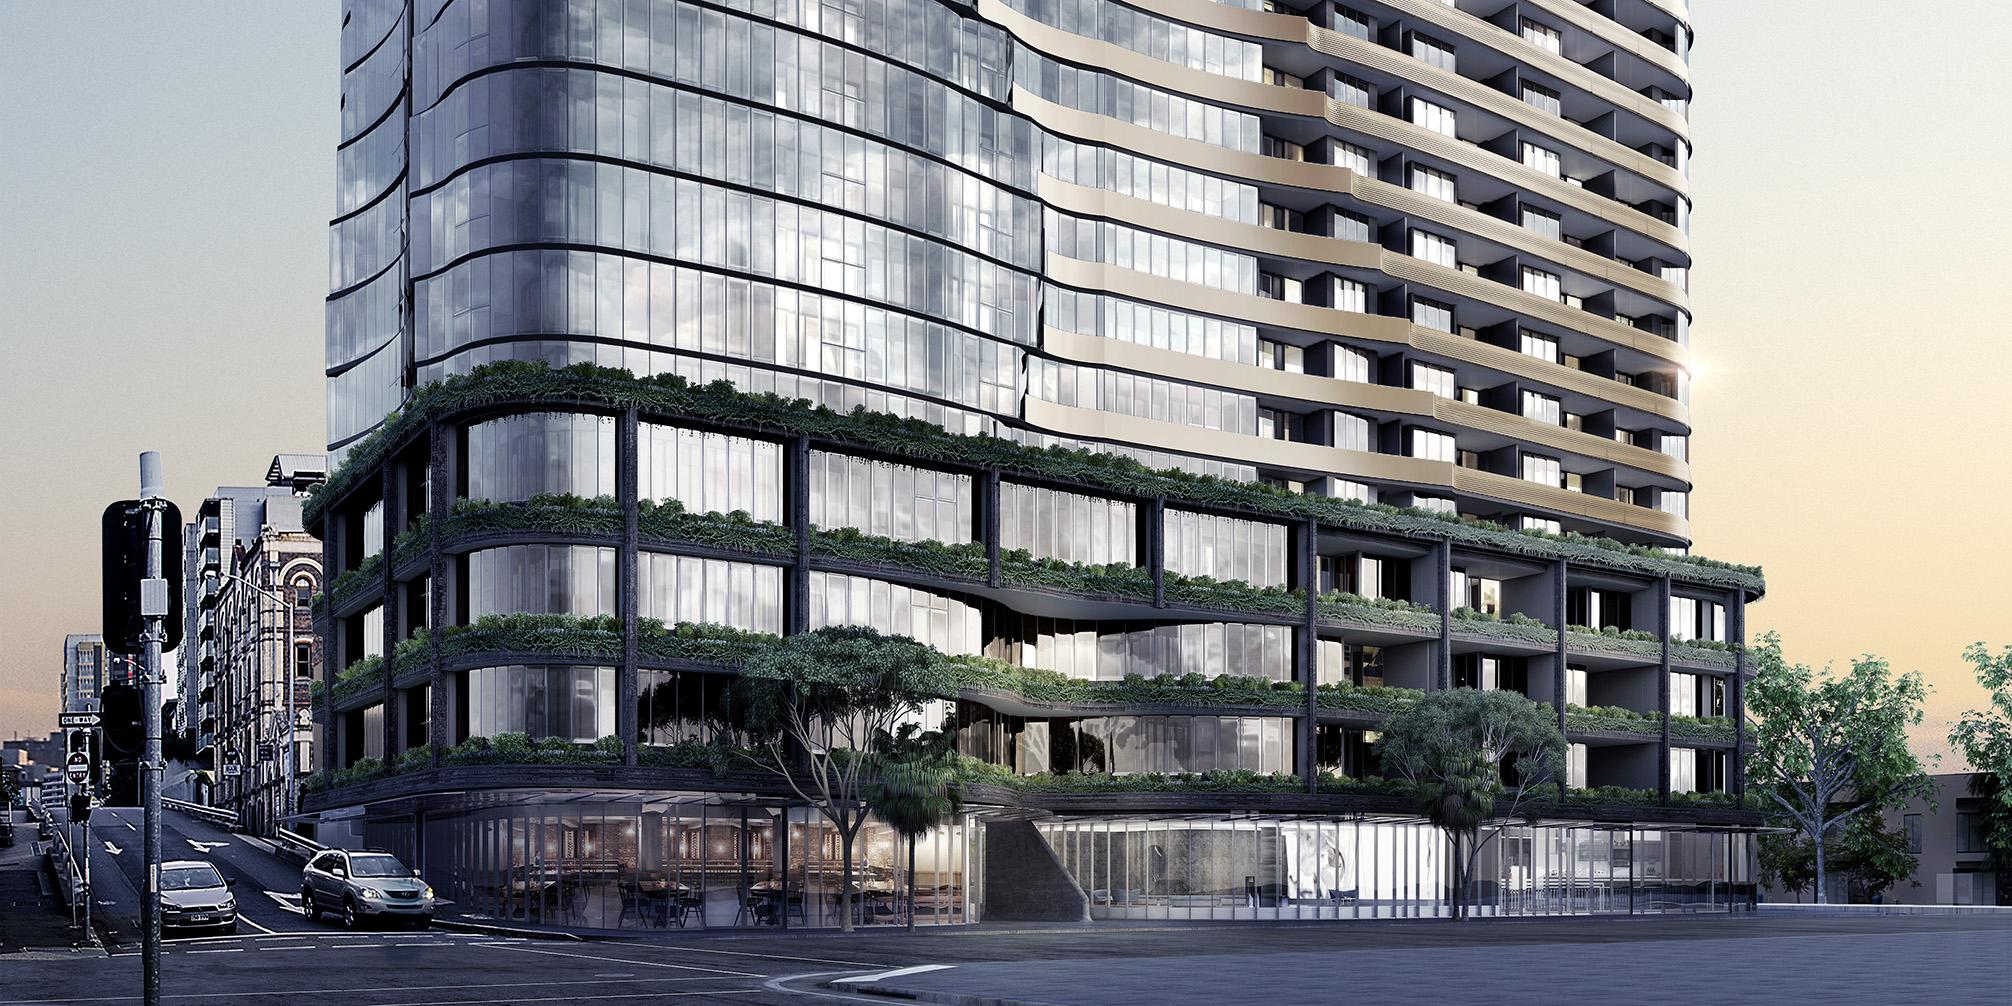 Wickham Street, Fortitude Valley, Brisbane, BPM, Property, Development, Apartments, Iconic